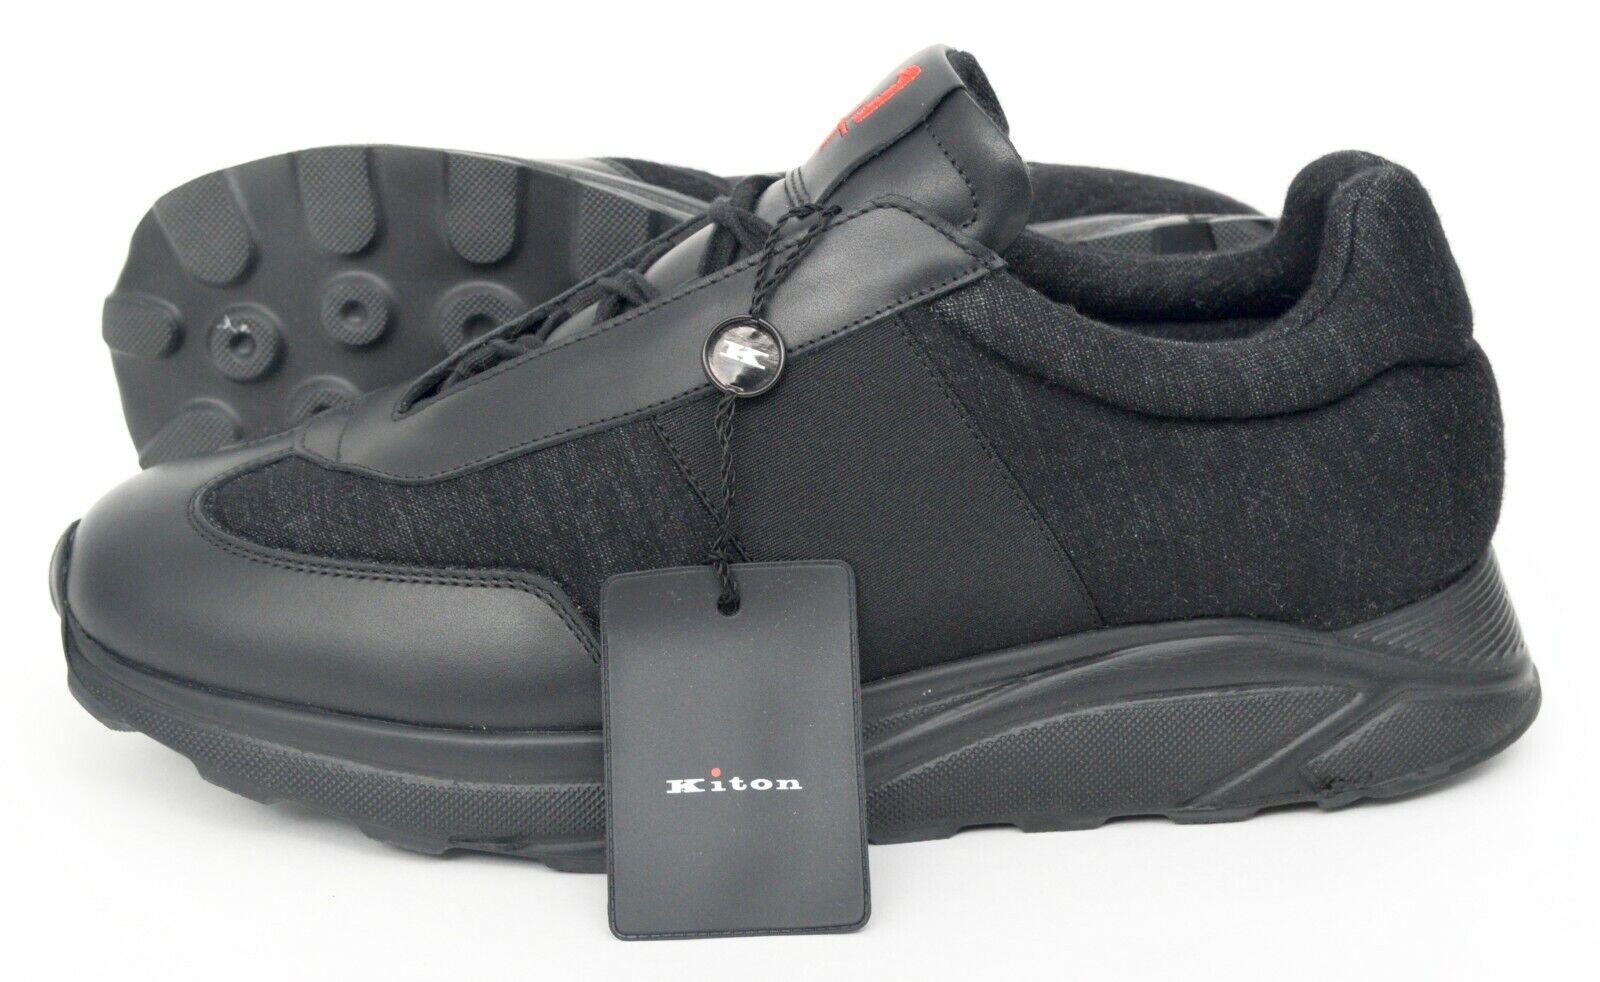 NIB KITON KNT +1 Plus Black Cashmere Leather Low Tops Shoes Sz. 8 (41)